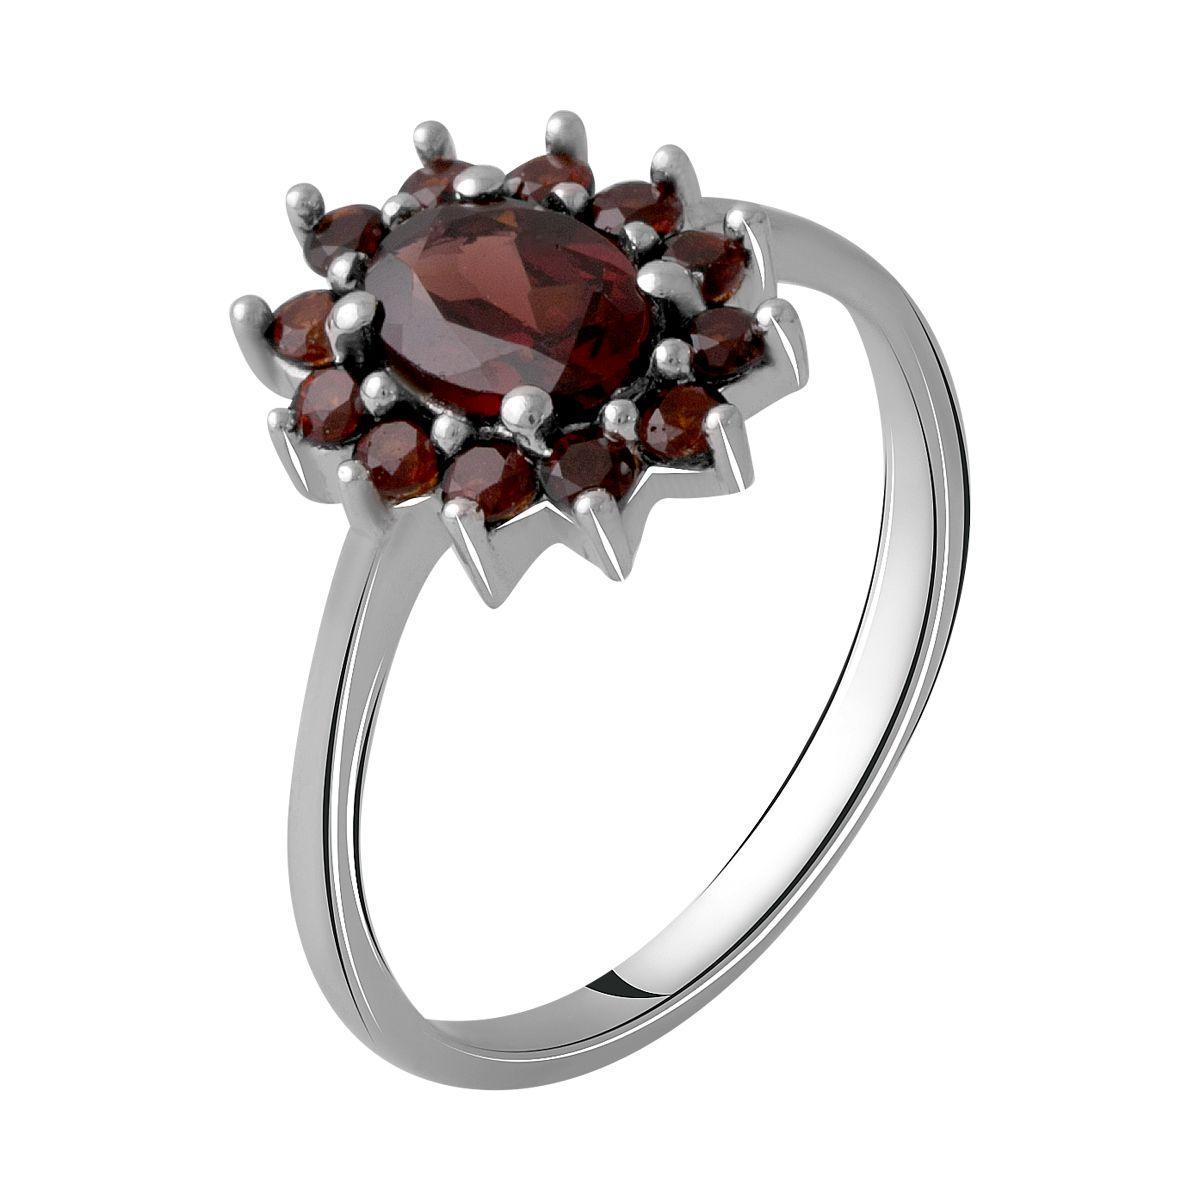 Серебряное кольцо DreamJewelry с натуральным гранатом 1.375ct (1965535) 18.5 размер